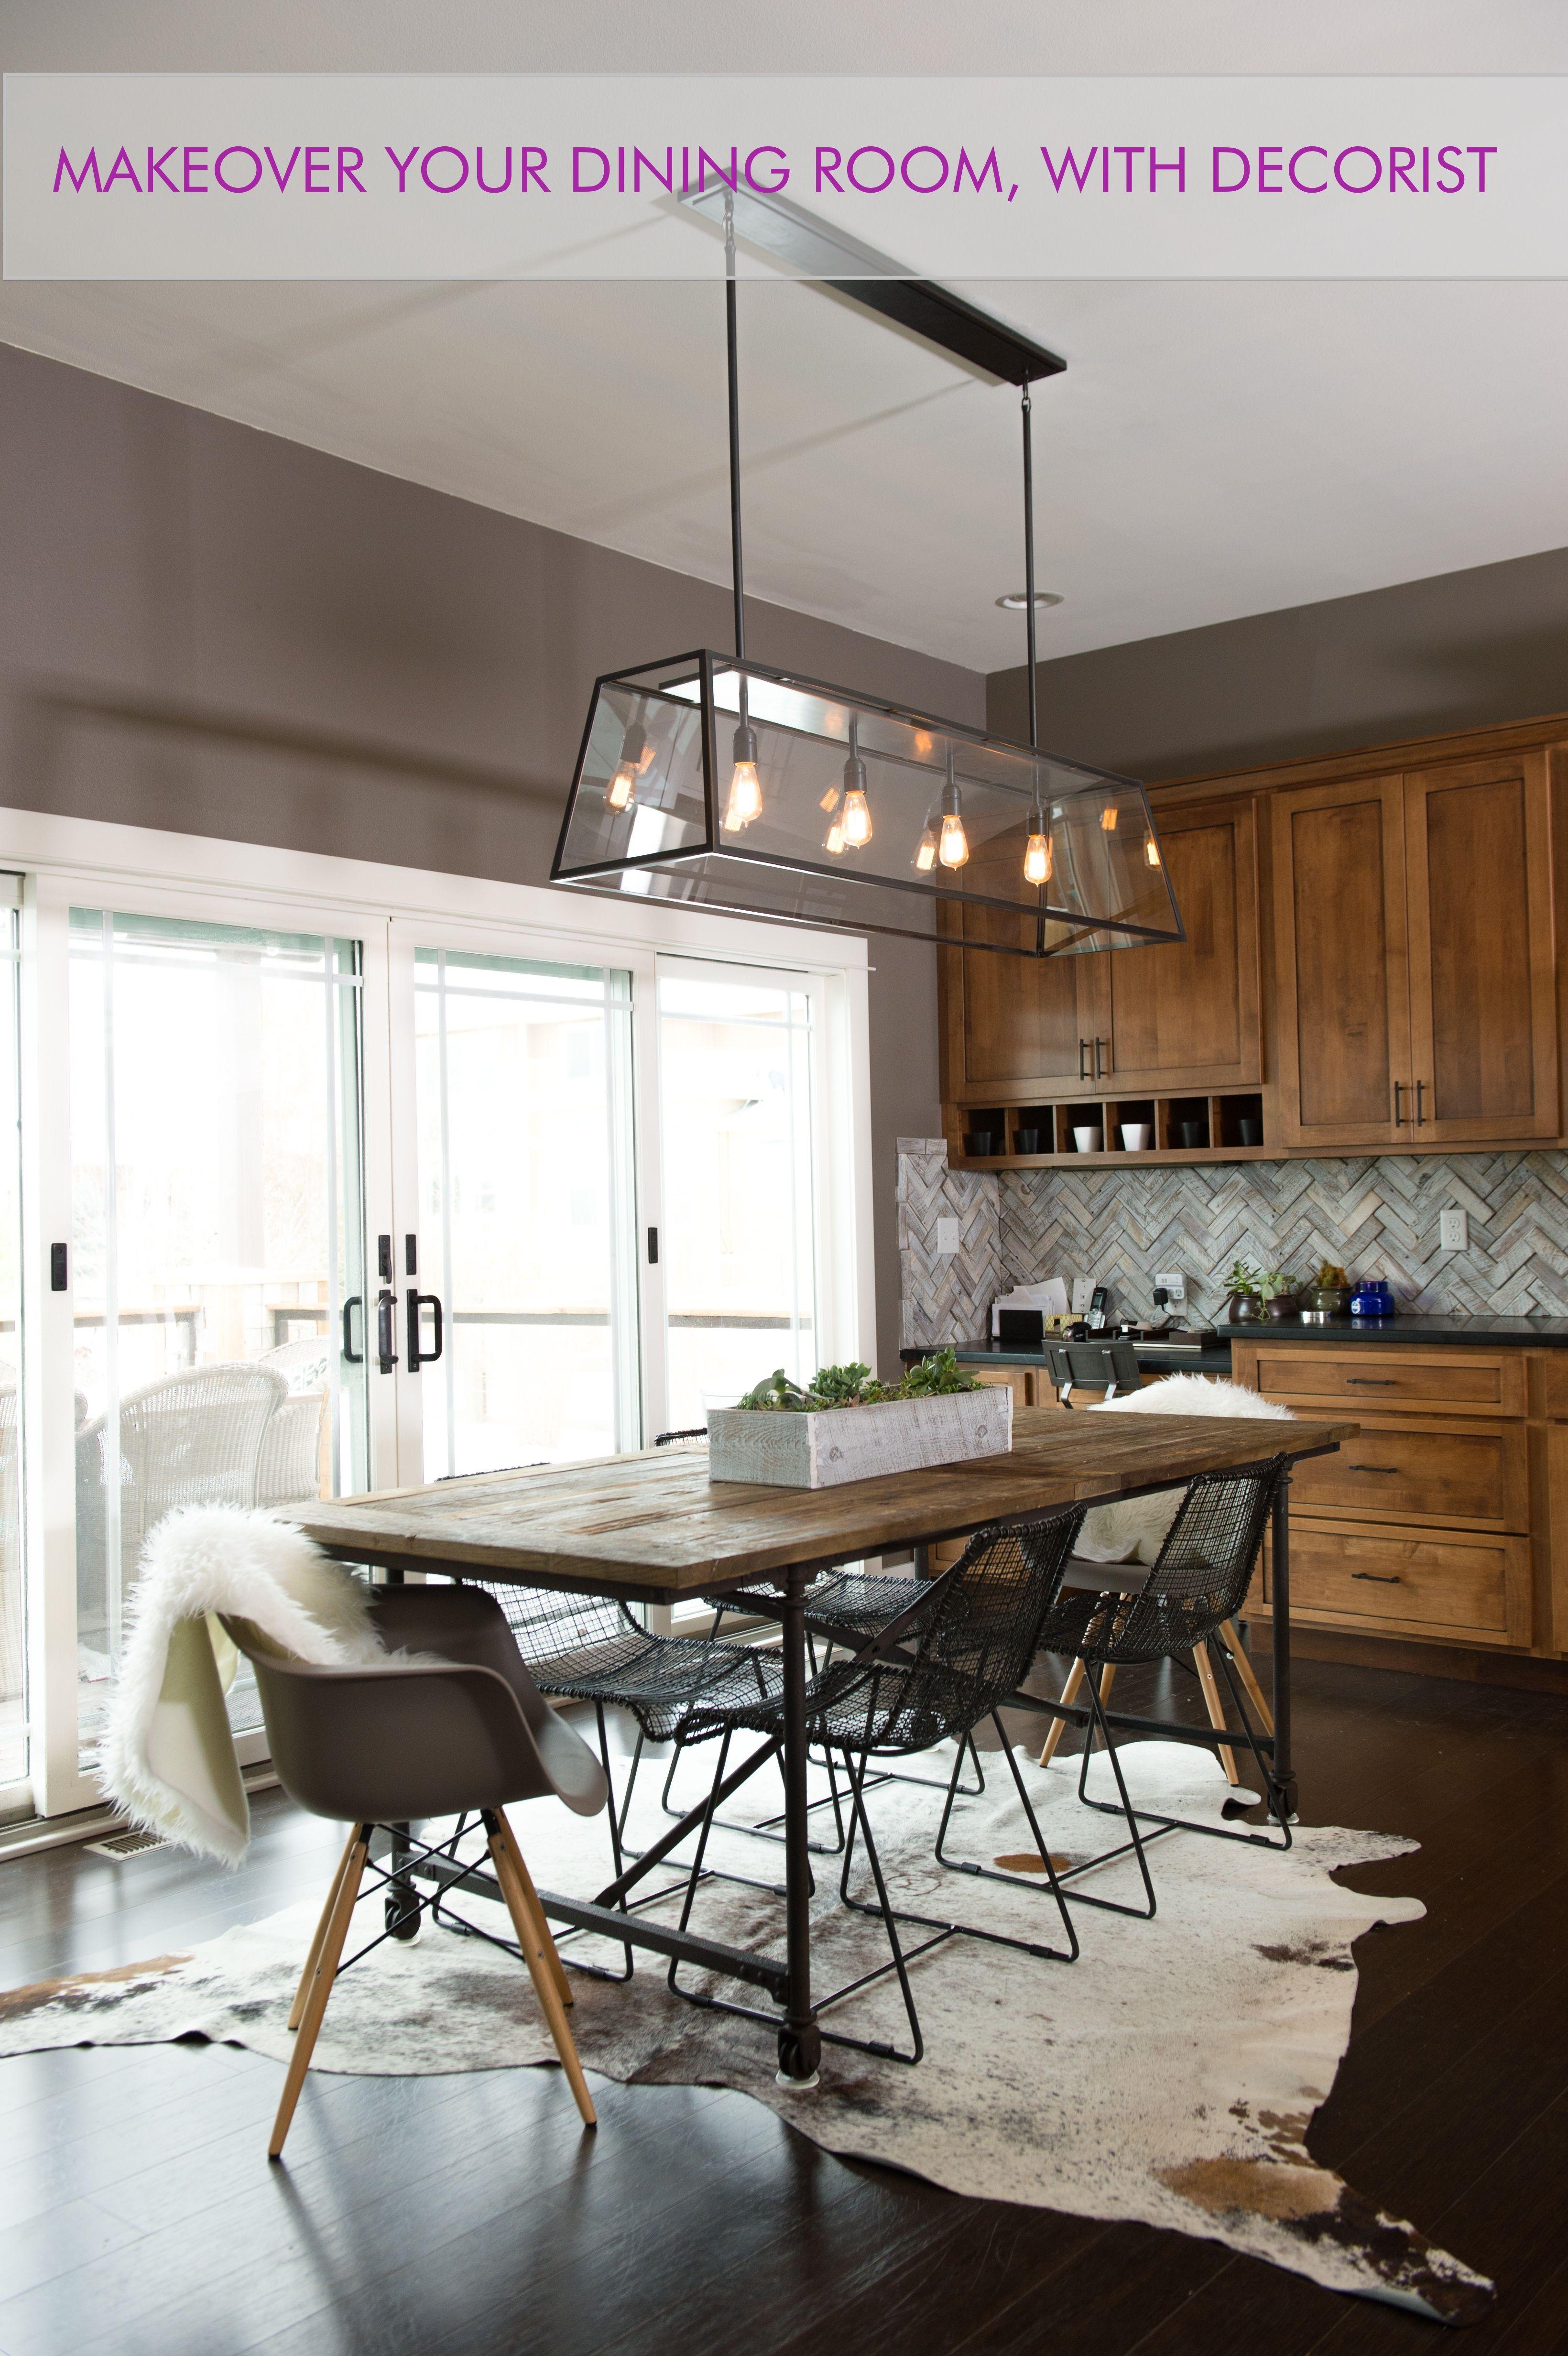 Top Interior Designers and Interior Decorators | The ...